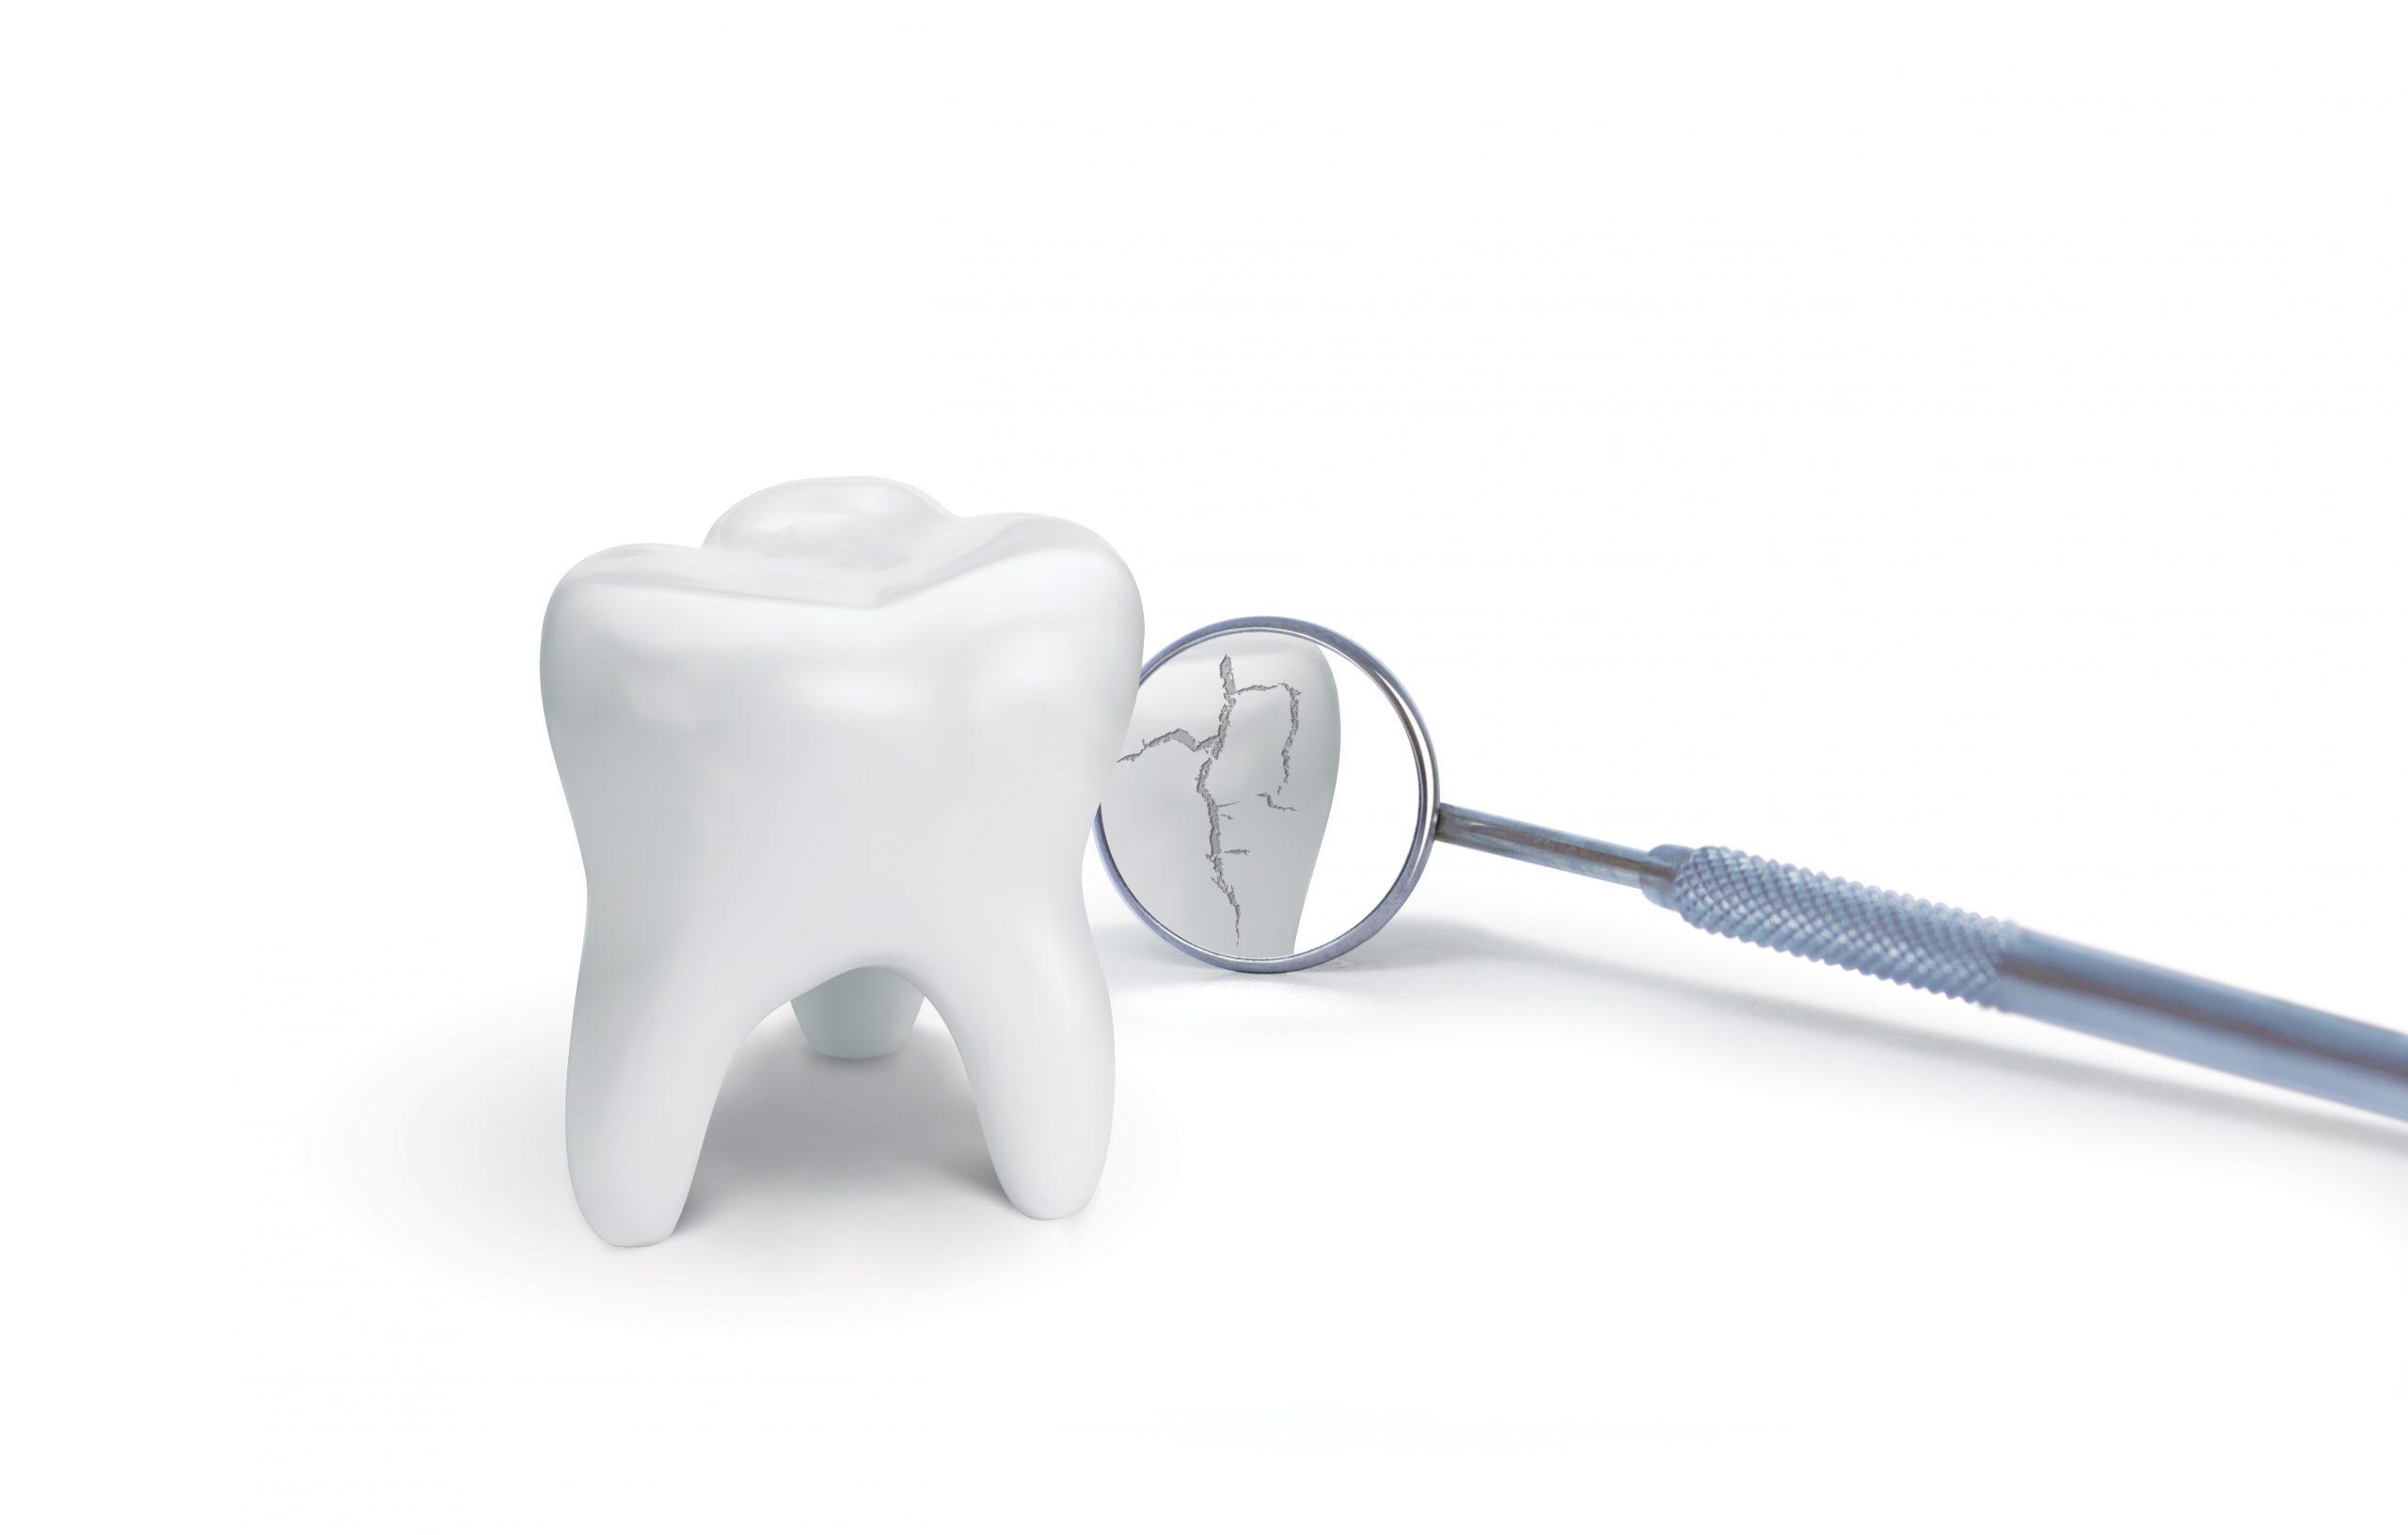 Broken tooth with dental mirror on white background. Creative idea